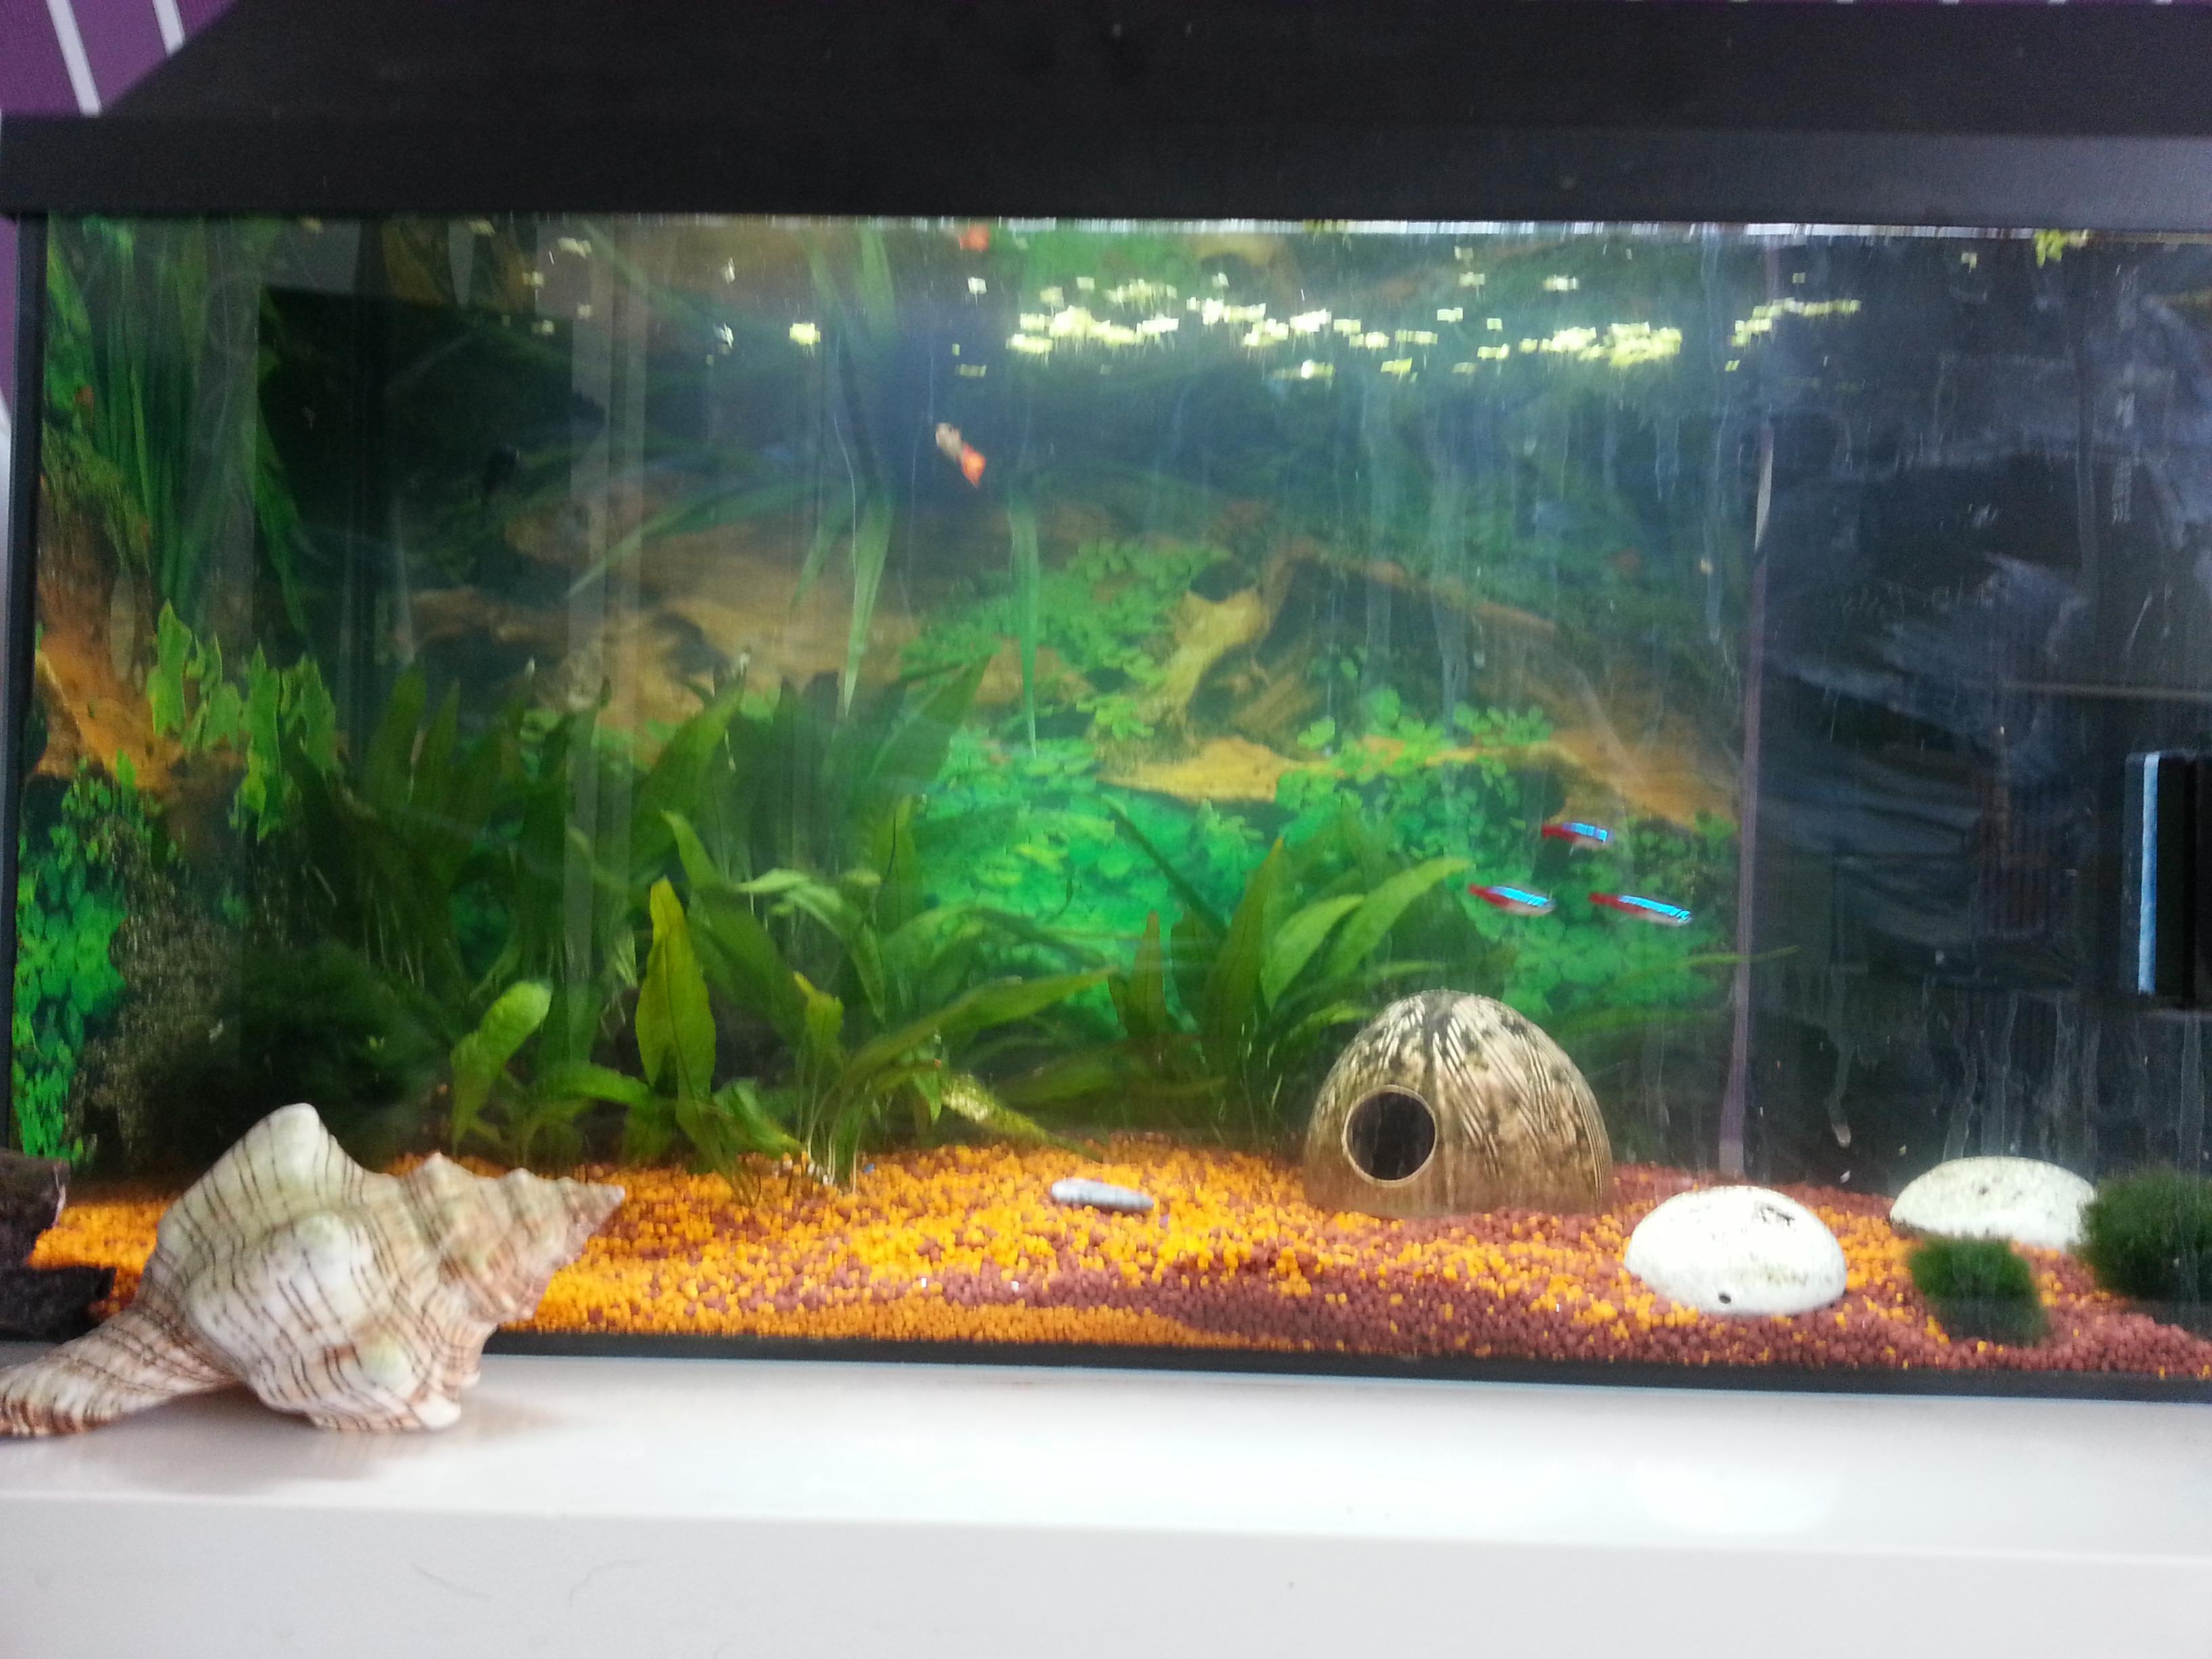 aquarium wasser weich tiere fische aquaristik. Black Bedroom Furniture Sets. Home Design Ideas